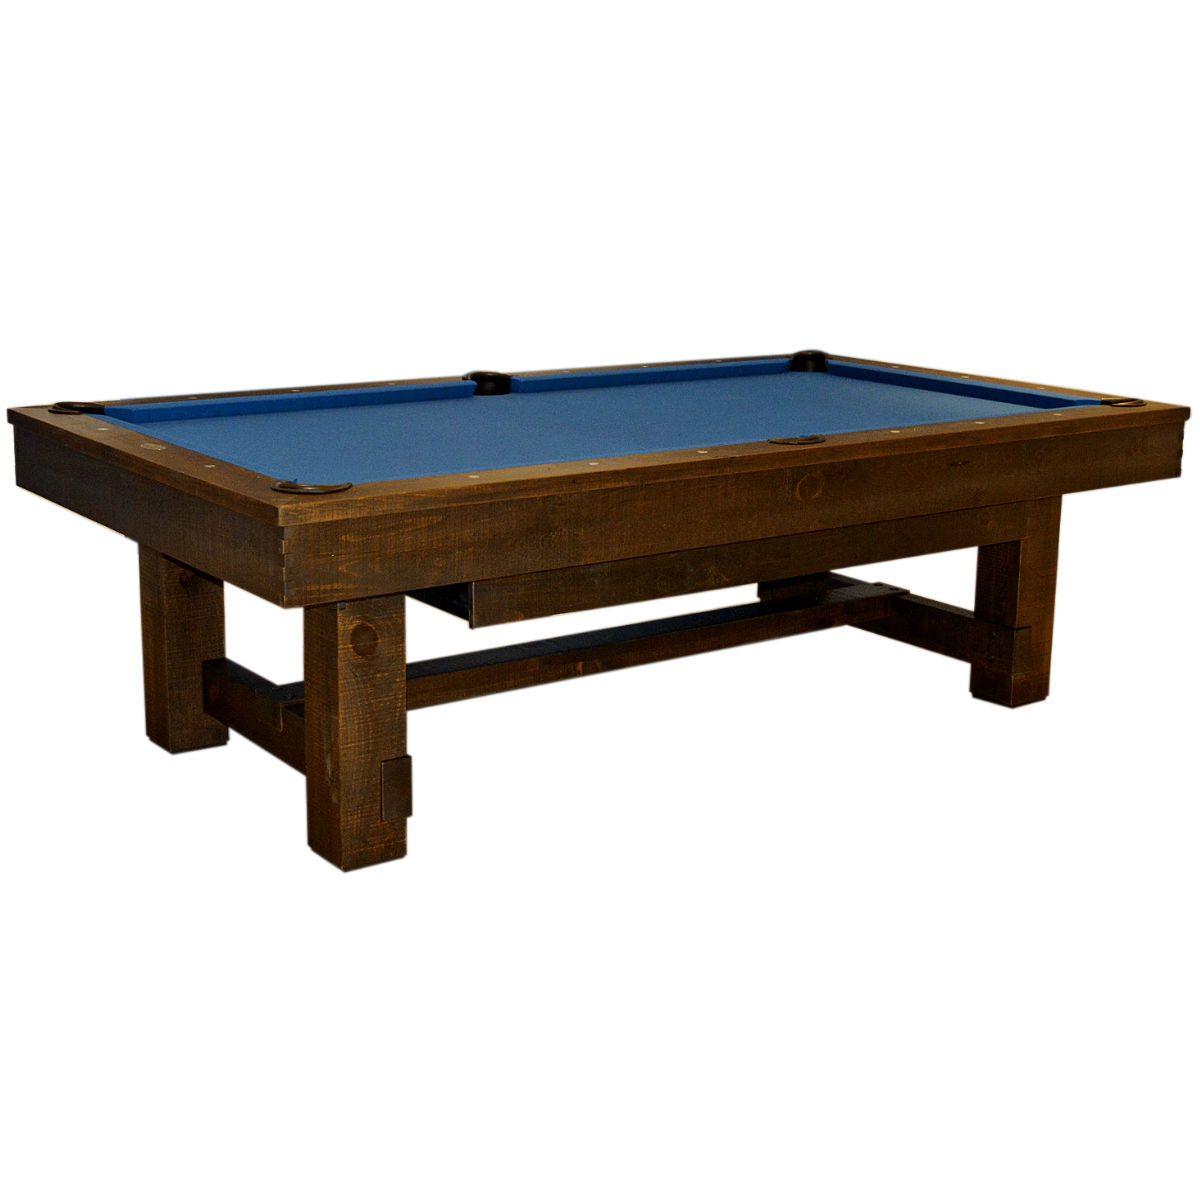 Pool table at madison pub - New Breckenridge Pool Table Olhausen Montgomeryville Pa